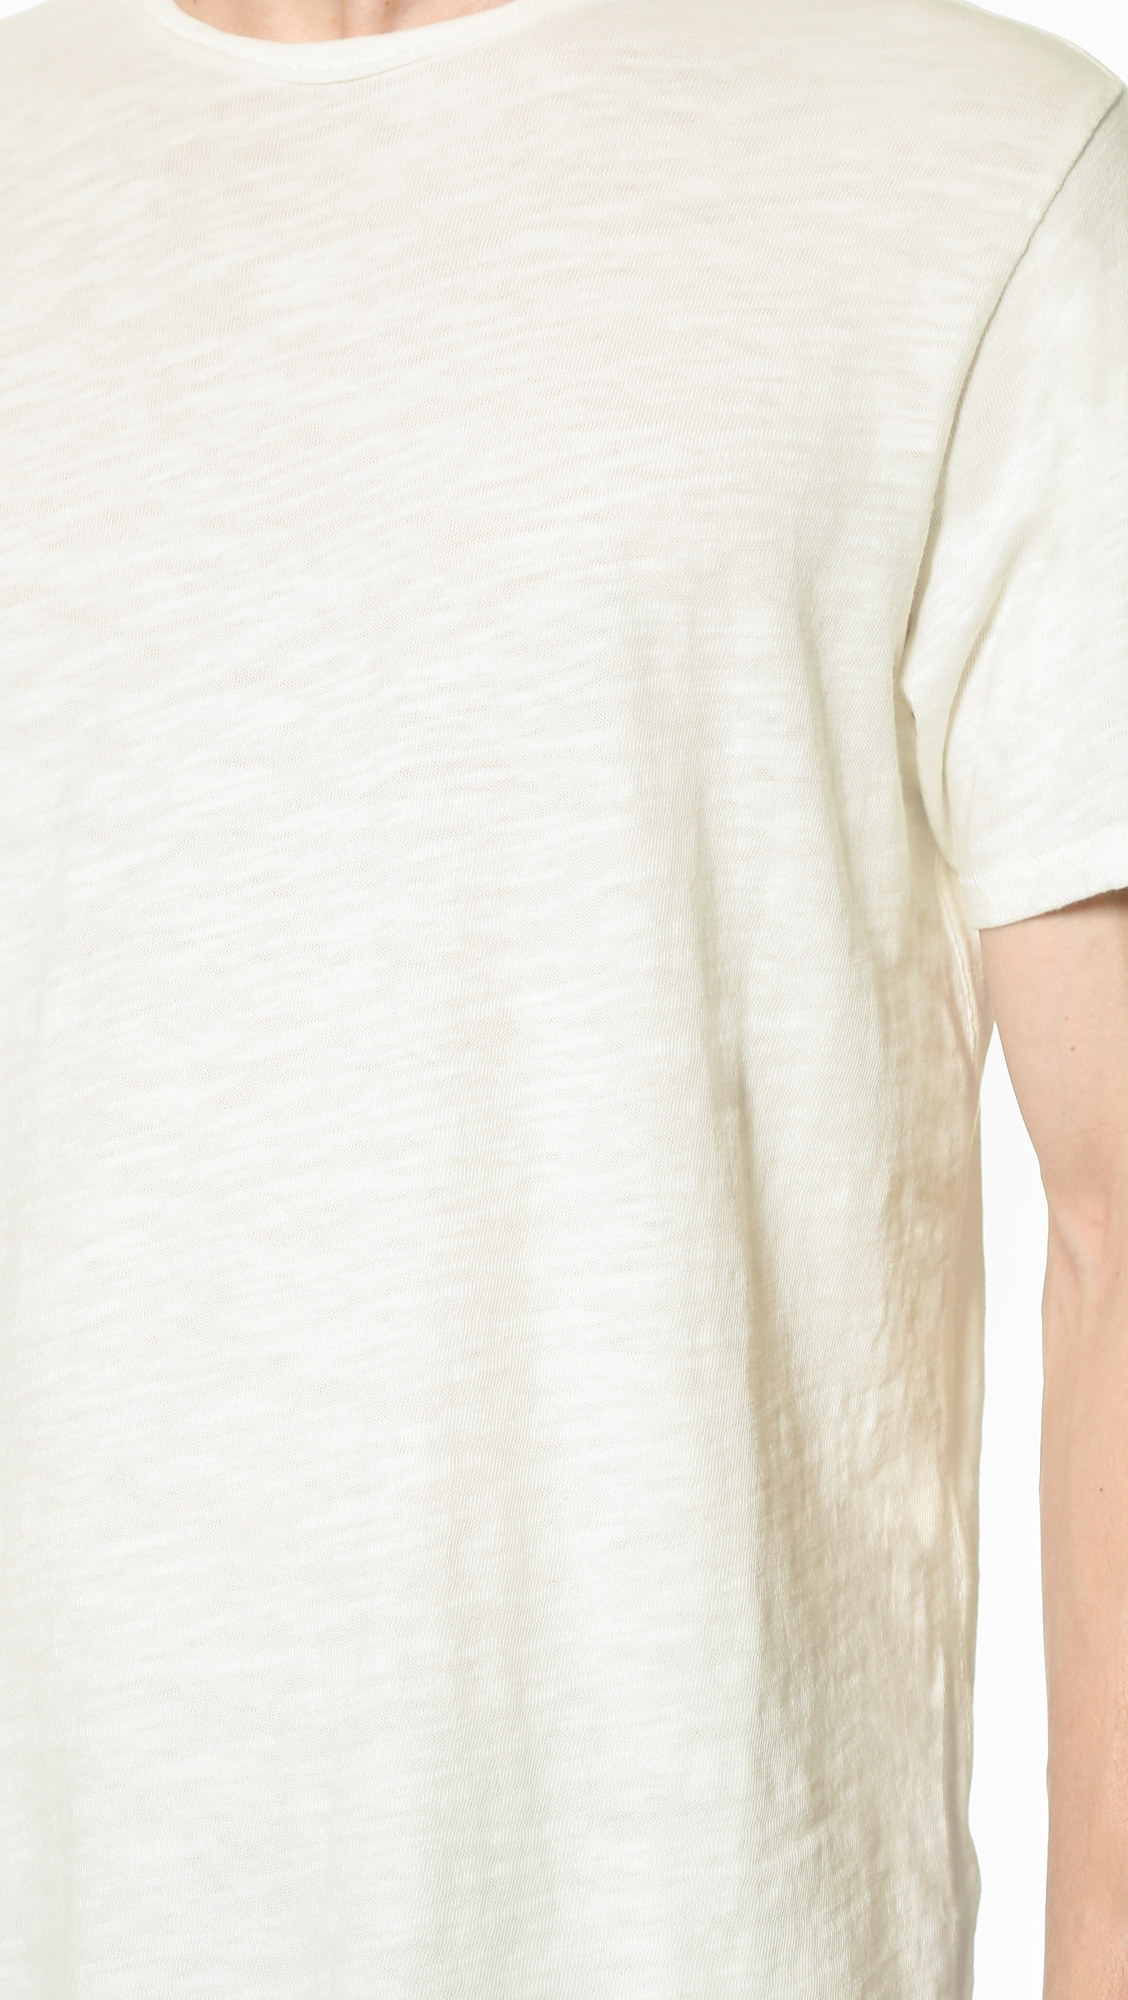 Rag bone basic t shirt in white for men lyst for Rag and bone t shirts